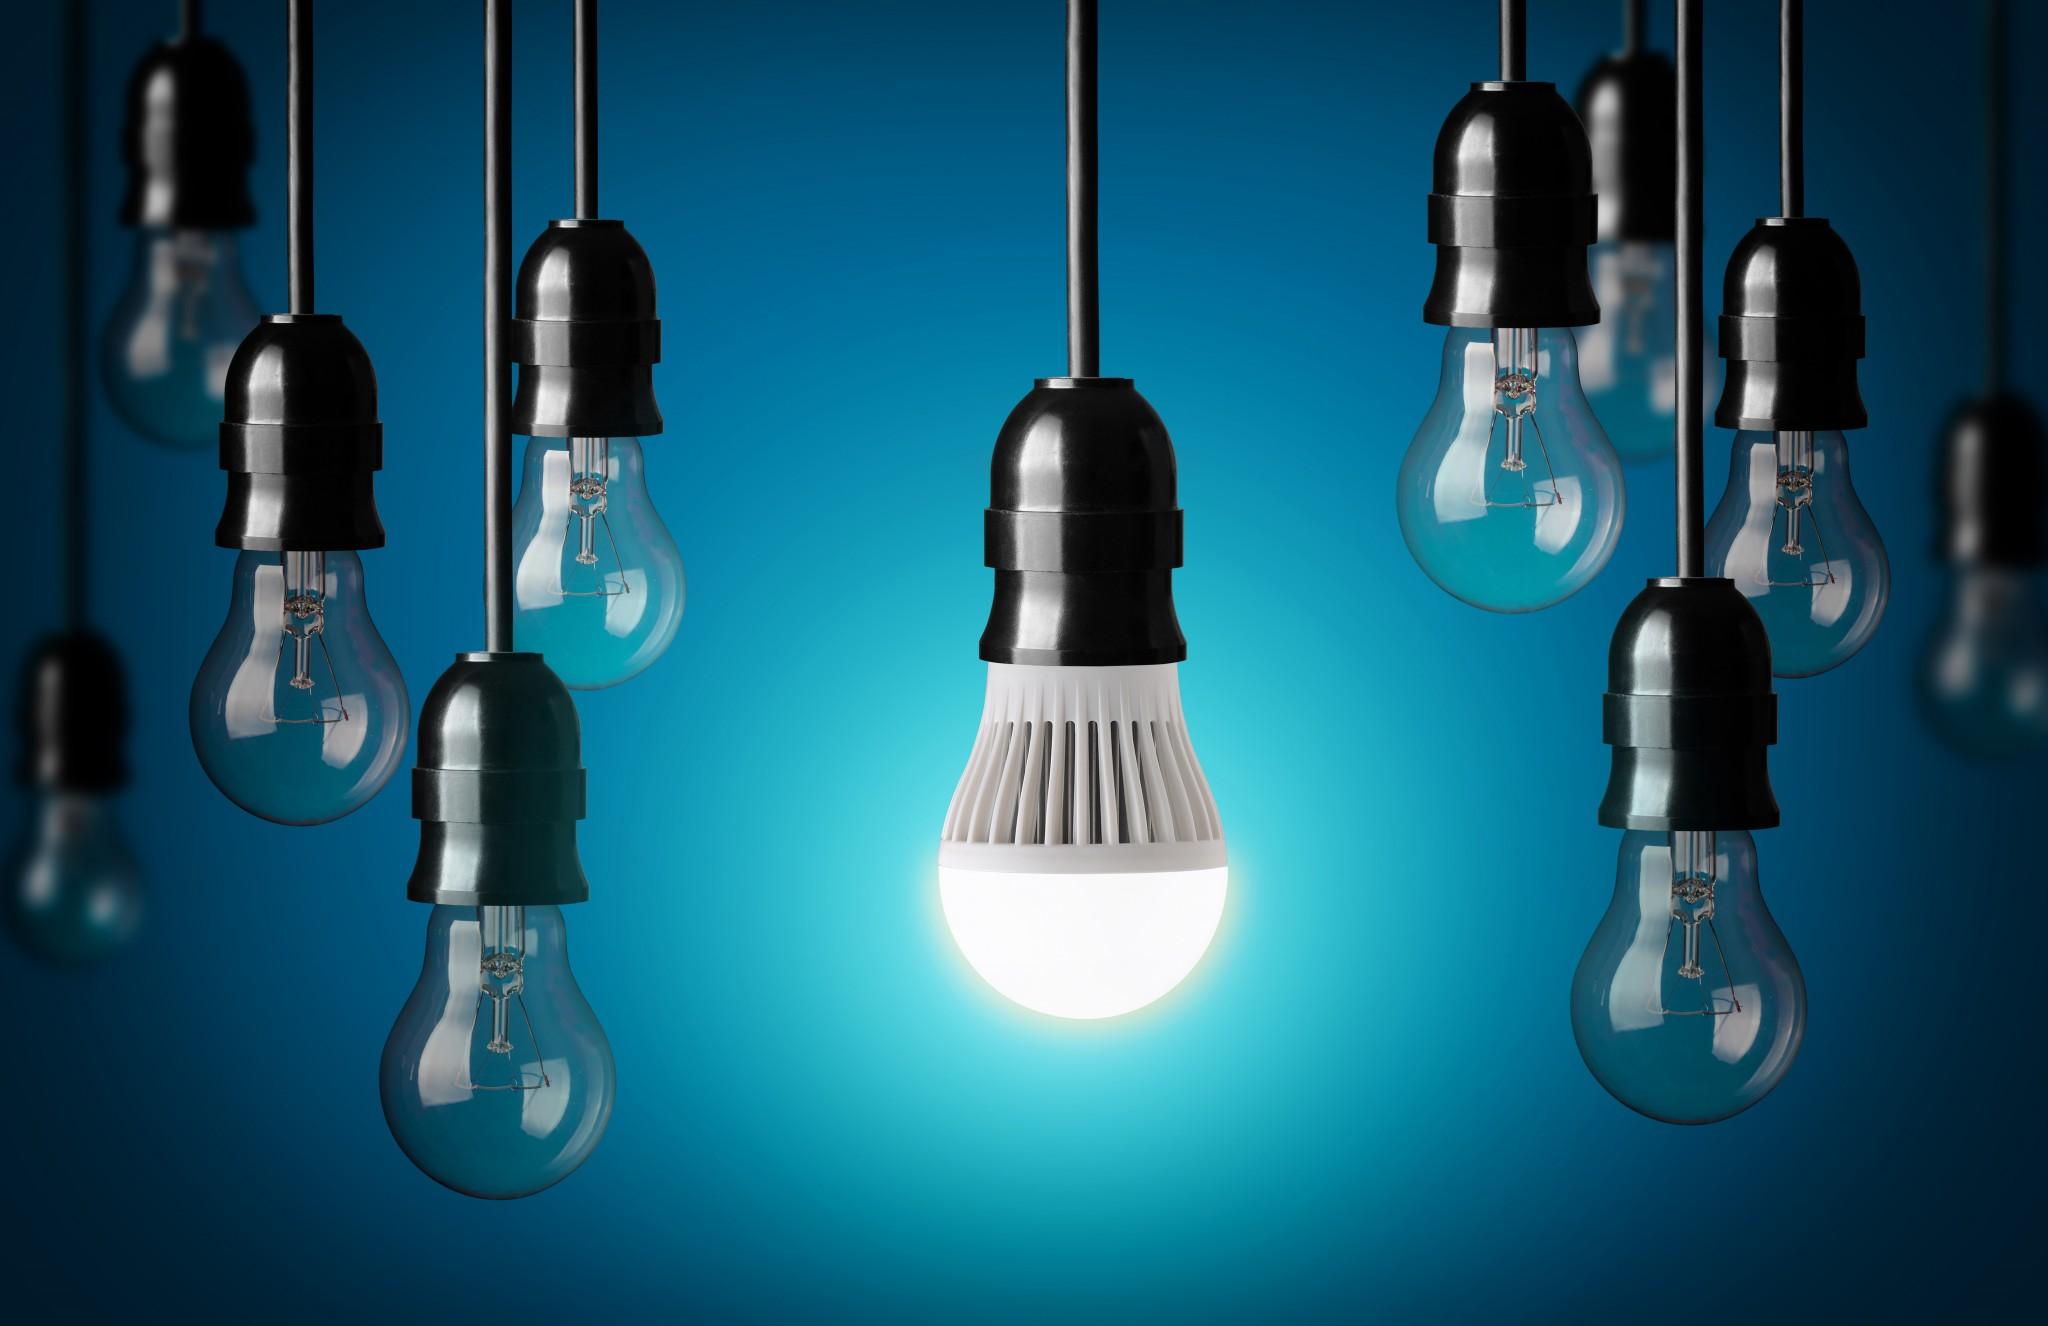 Everyday economics of LED bulbs